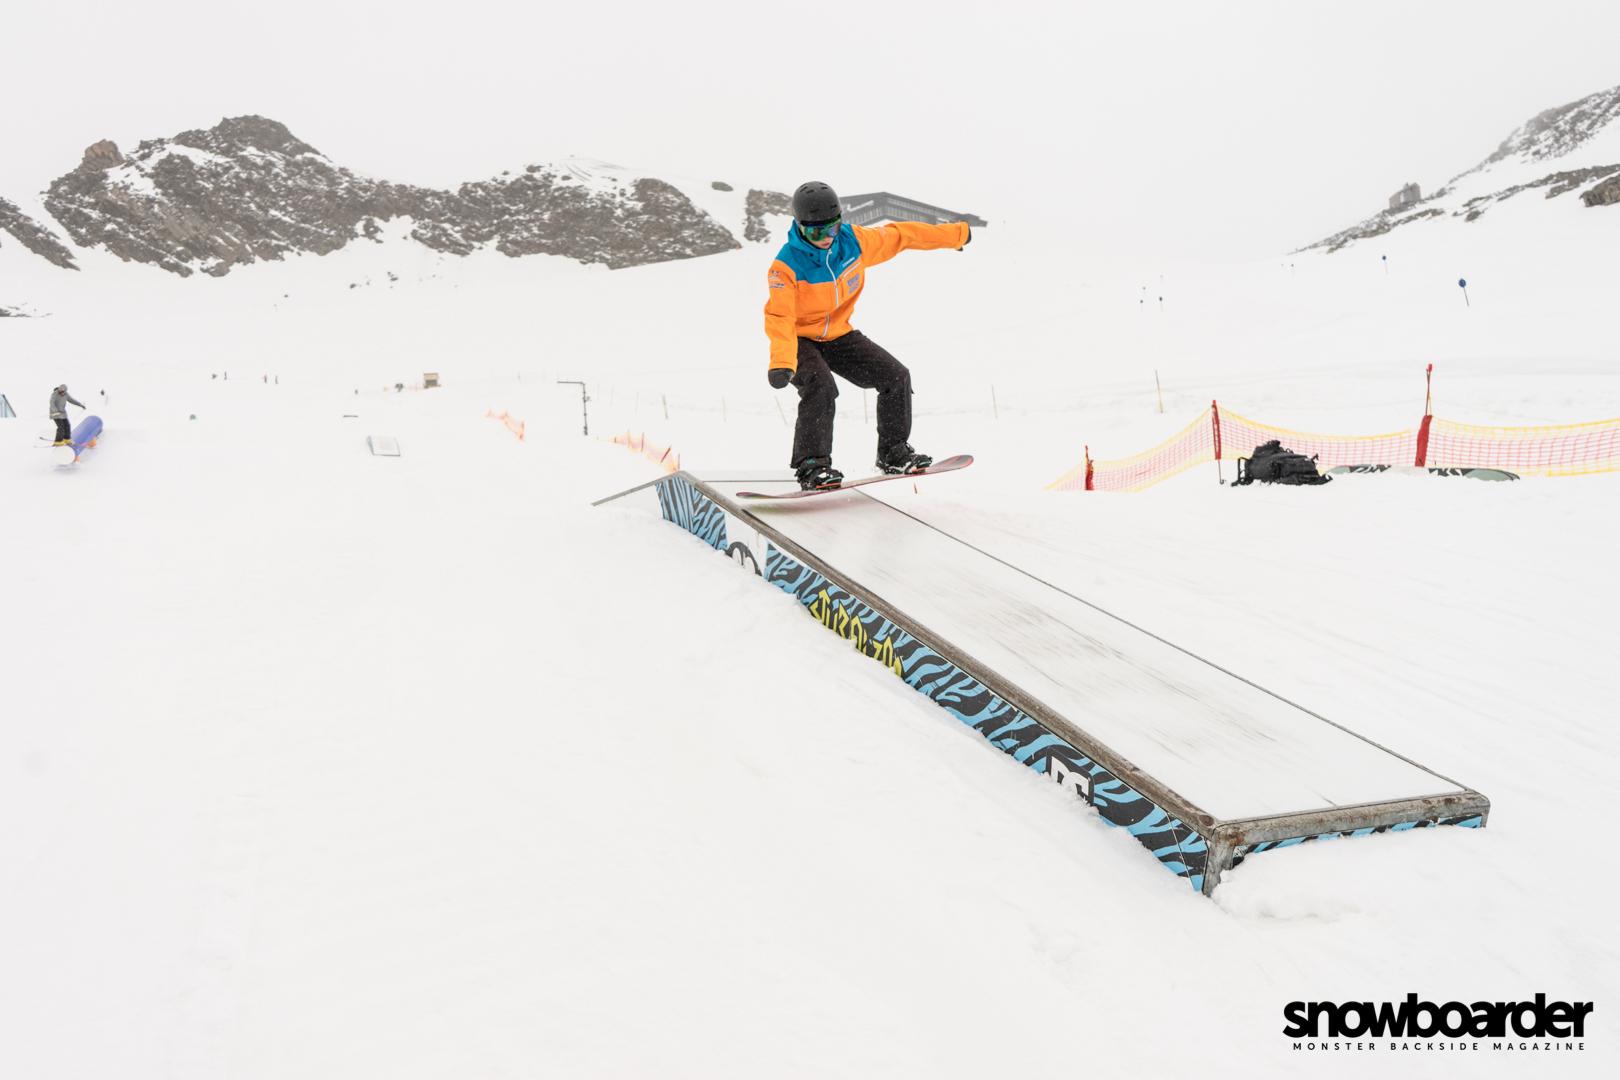 snowboardermbm-13